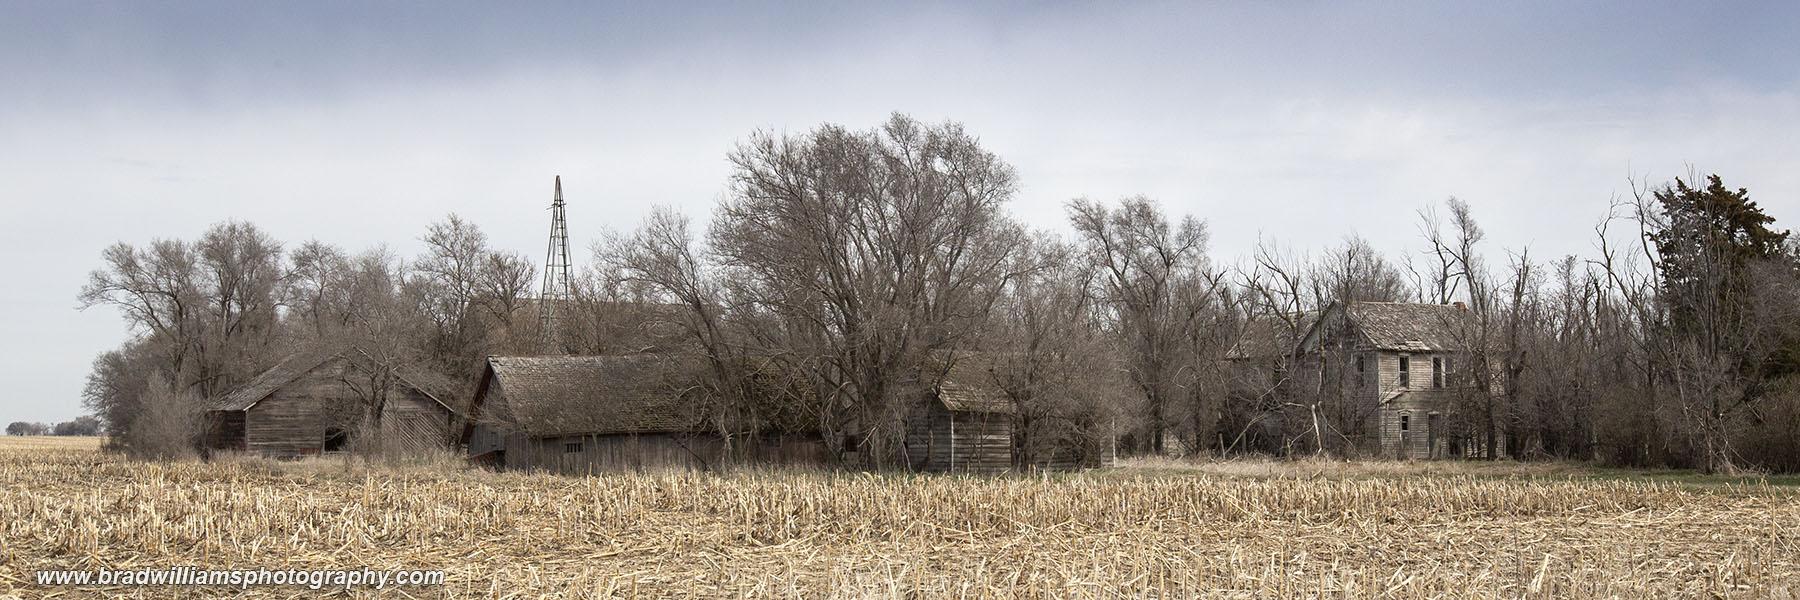 Nebraska, Farm, midwest, photo